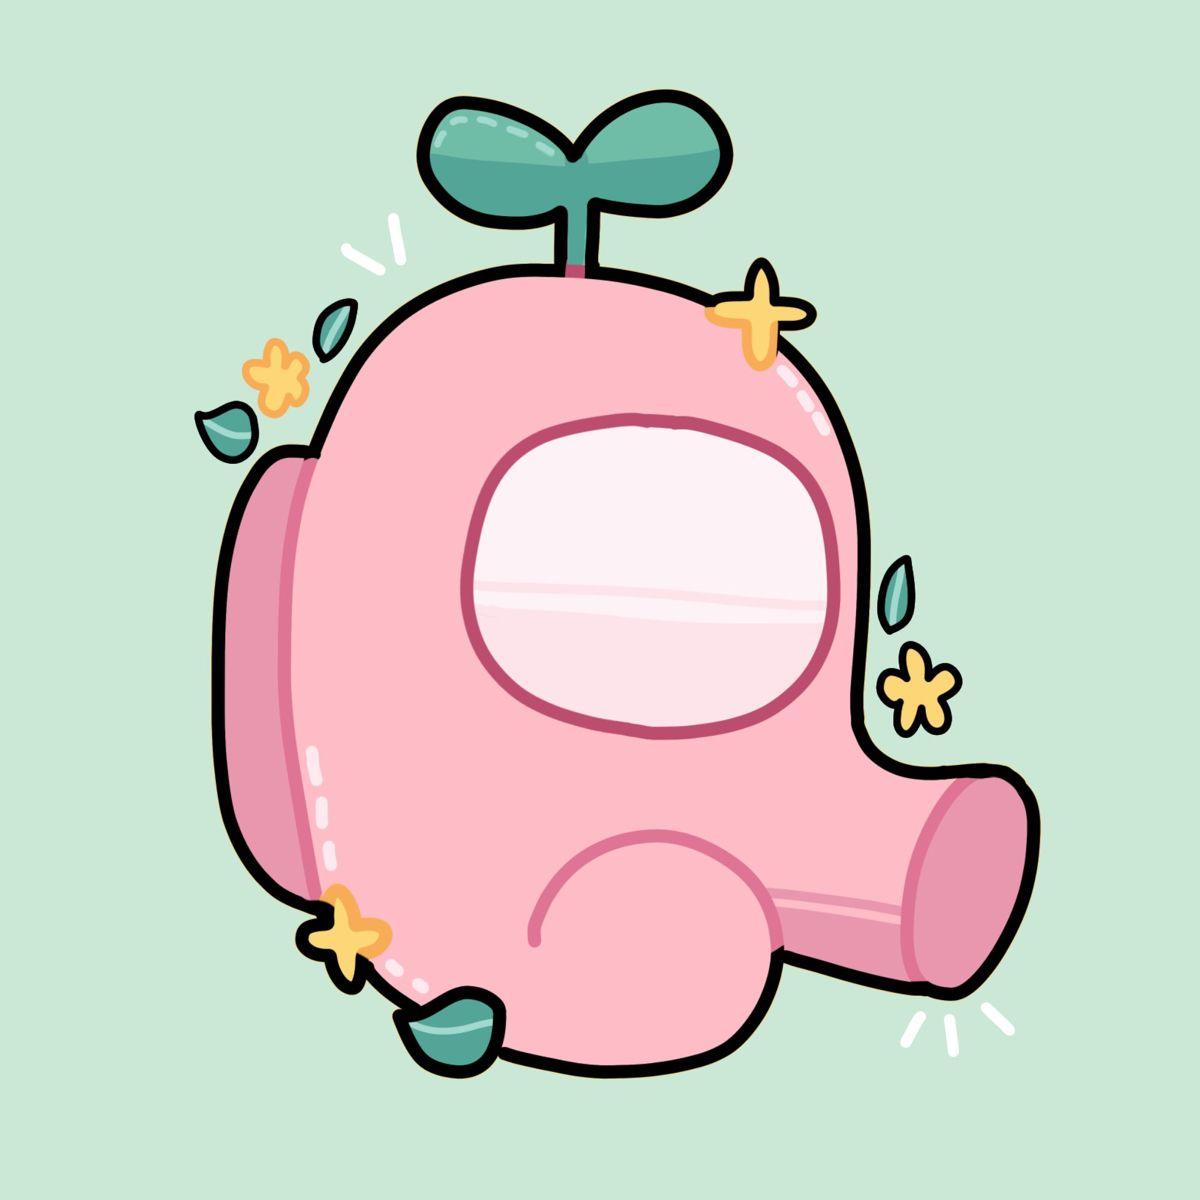 Save Follow Amongus Amongusfanart Cute Drawings Cute Cartoon Wallpapers Cute Patterns Wallpaper